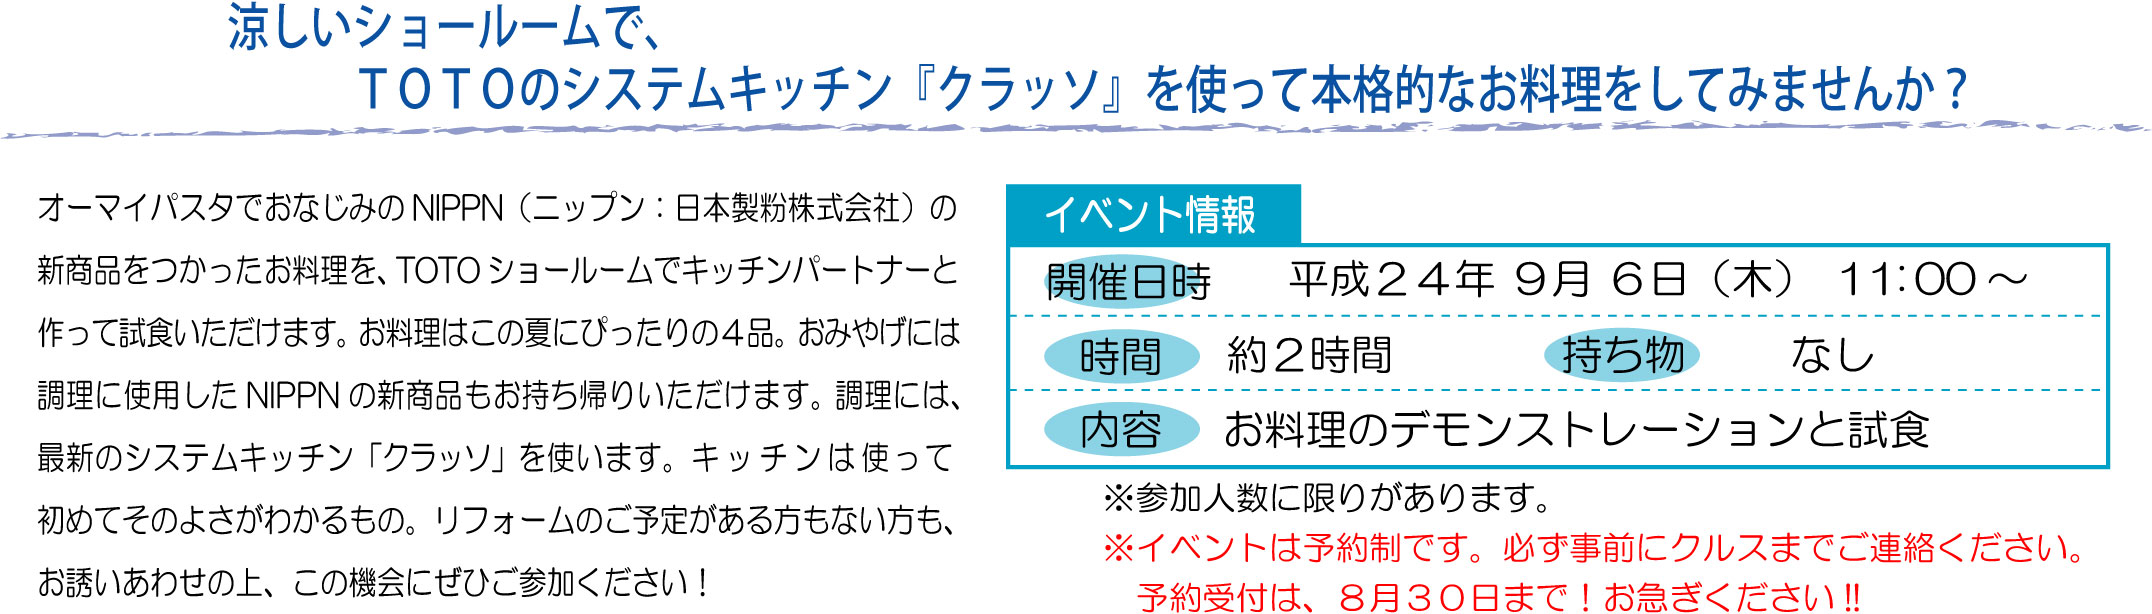 KuraSi-natu-sin63-15.jpg